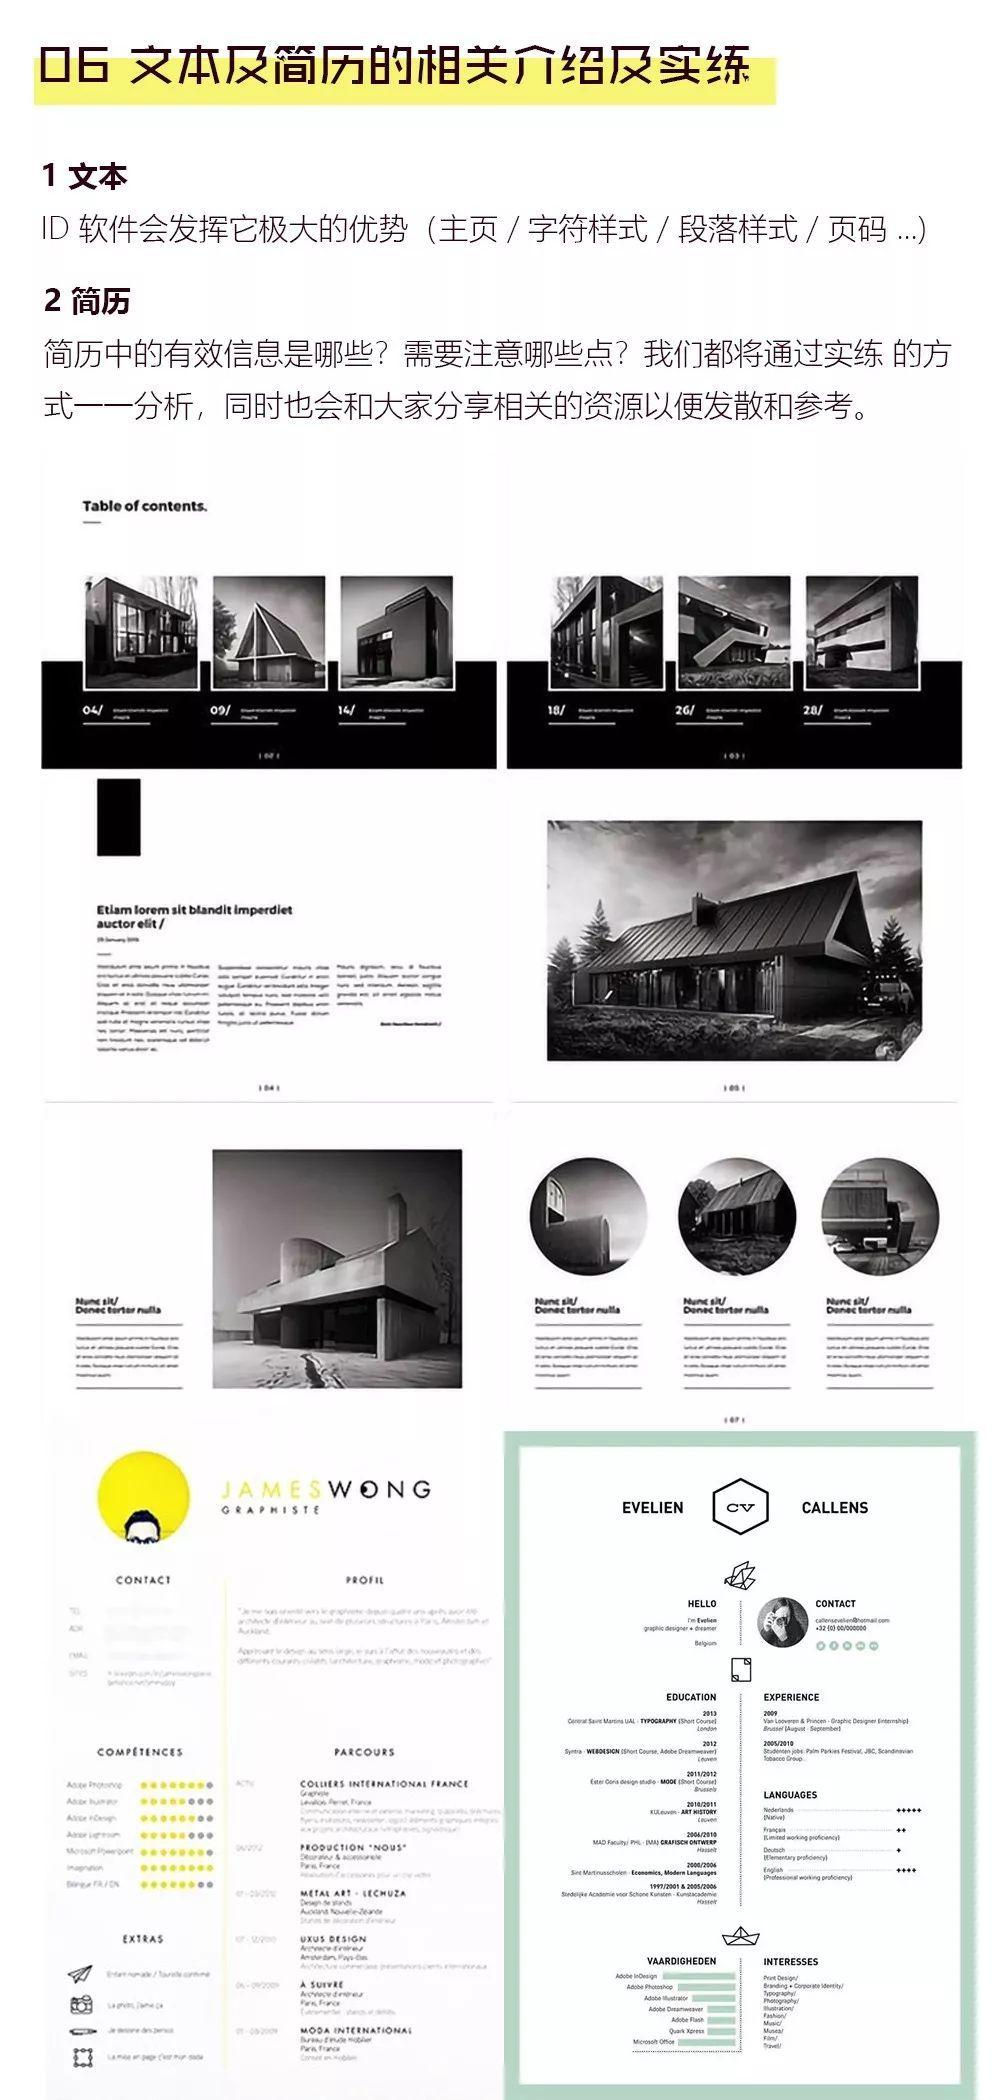 indesign工作流與作品集版式設計1.0圖片